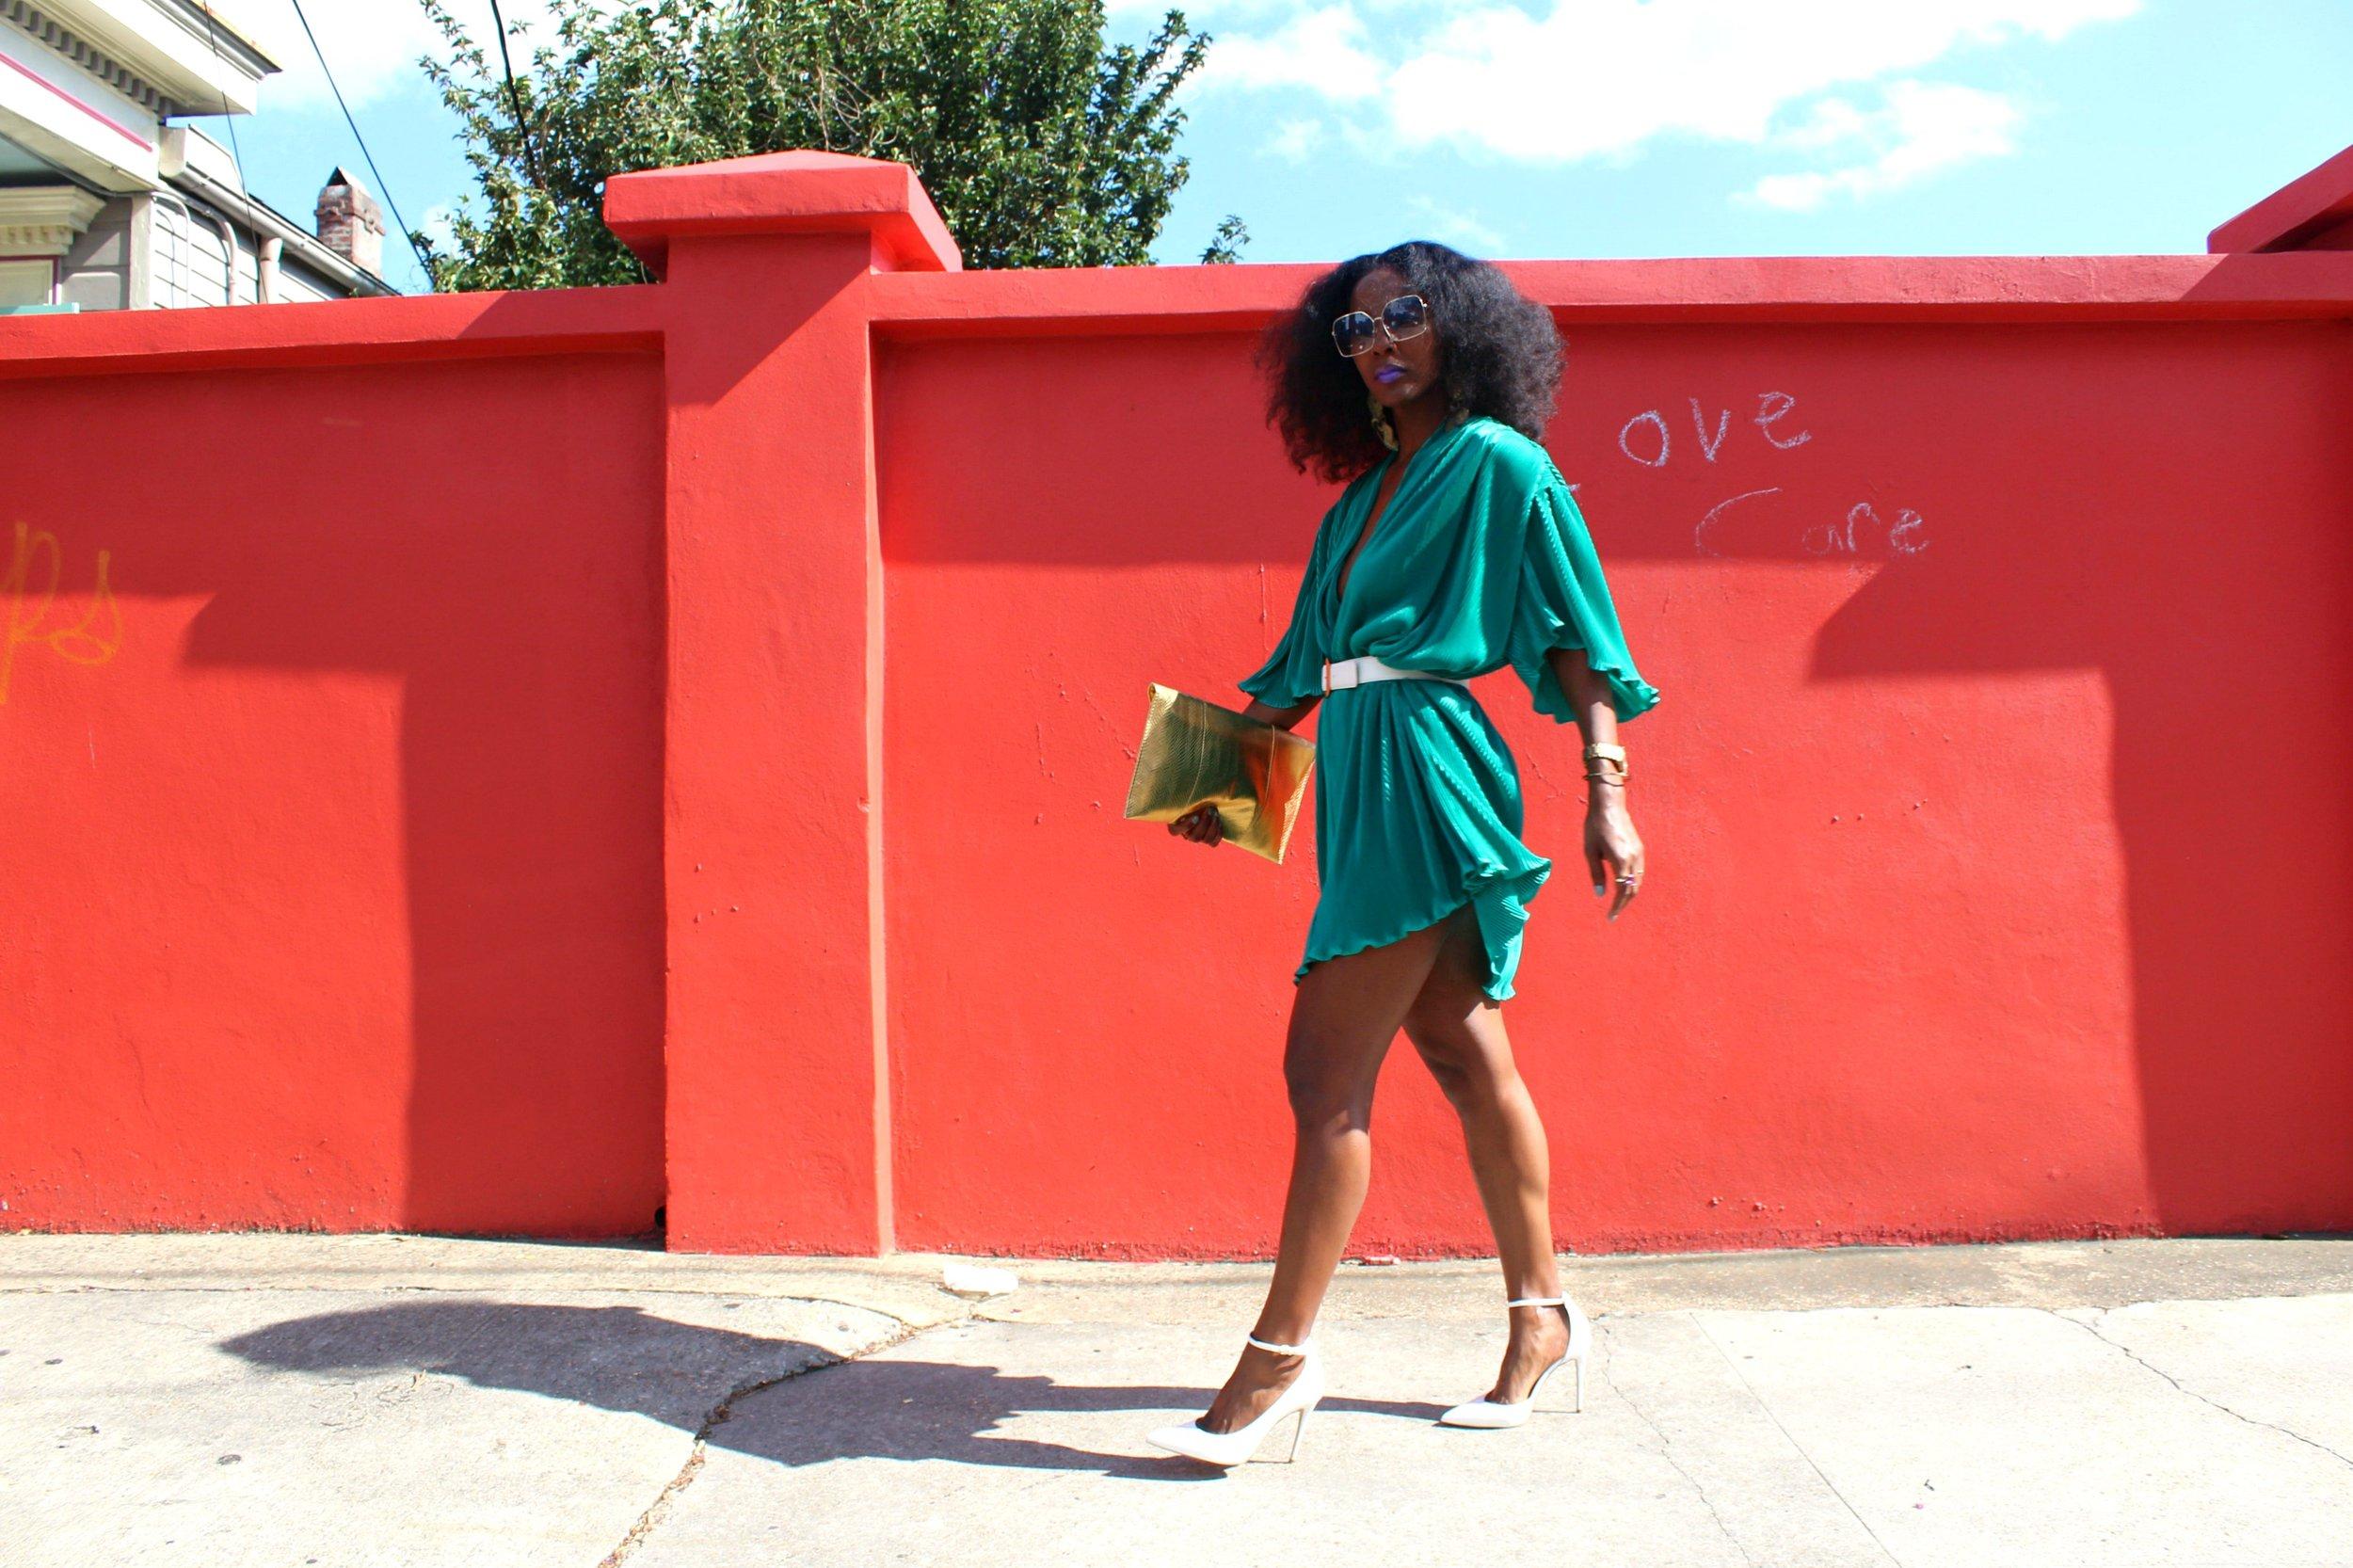 Aldo Staycey White Heels + Vintage Teal Dress